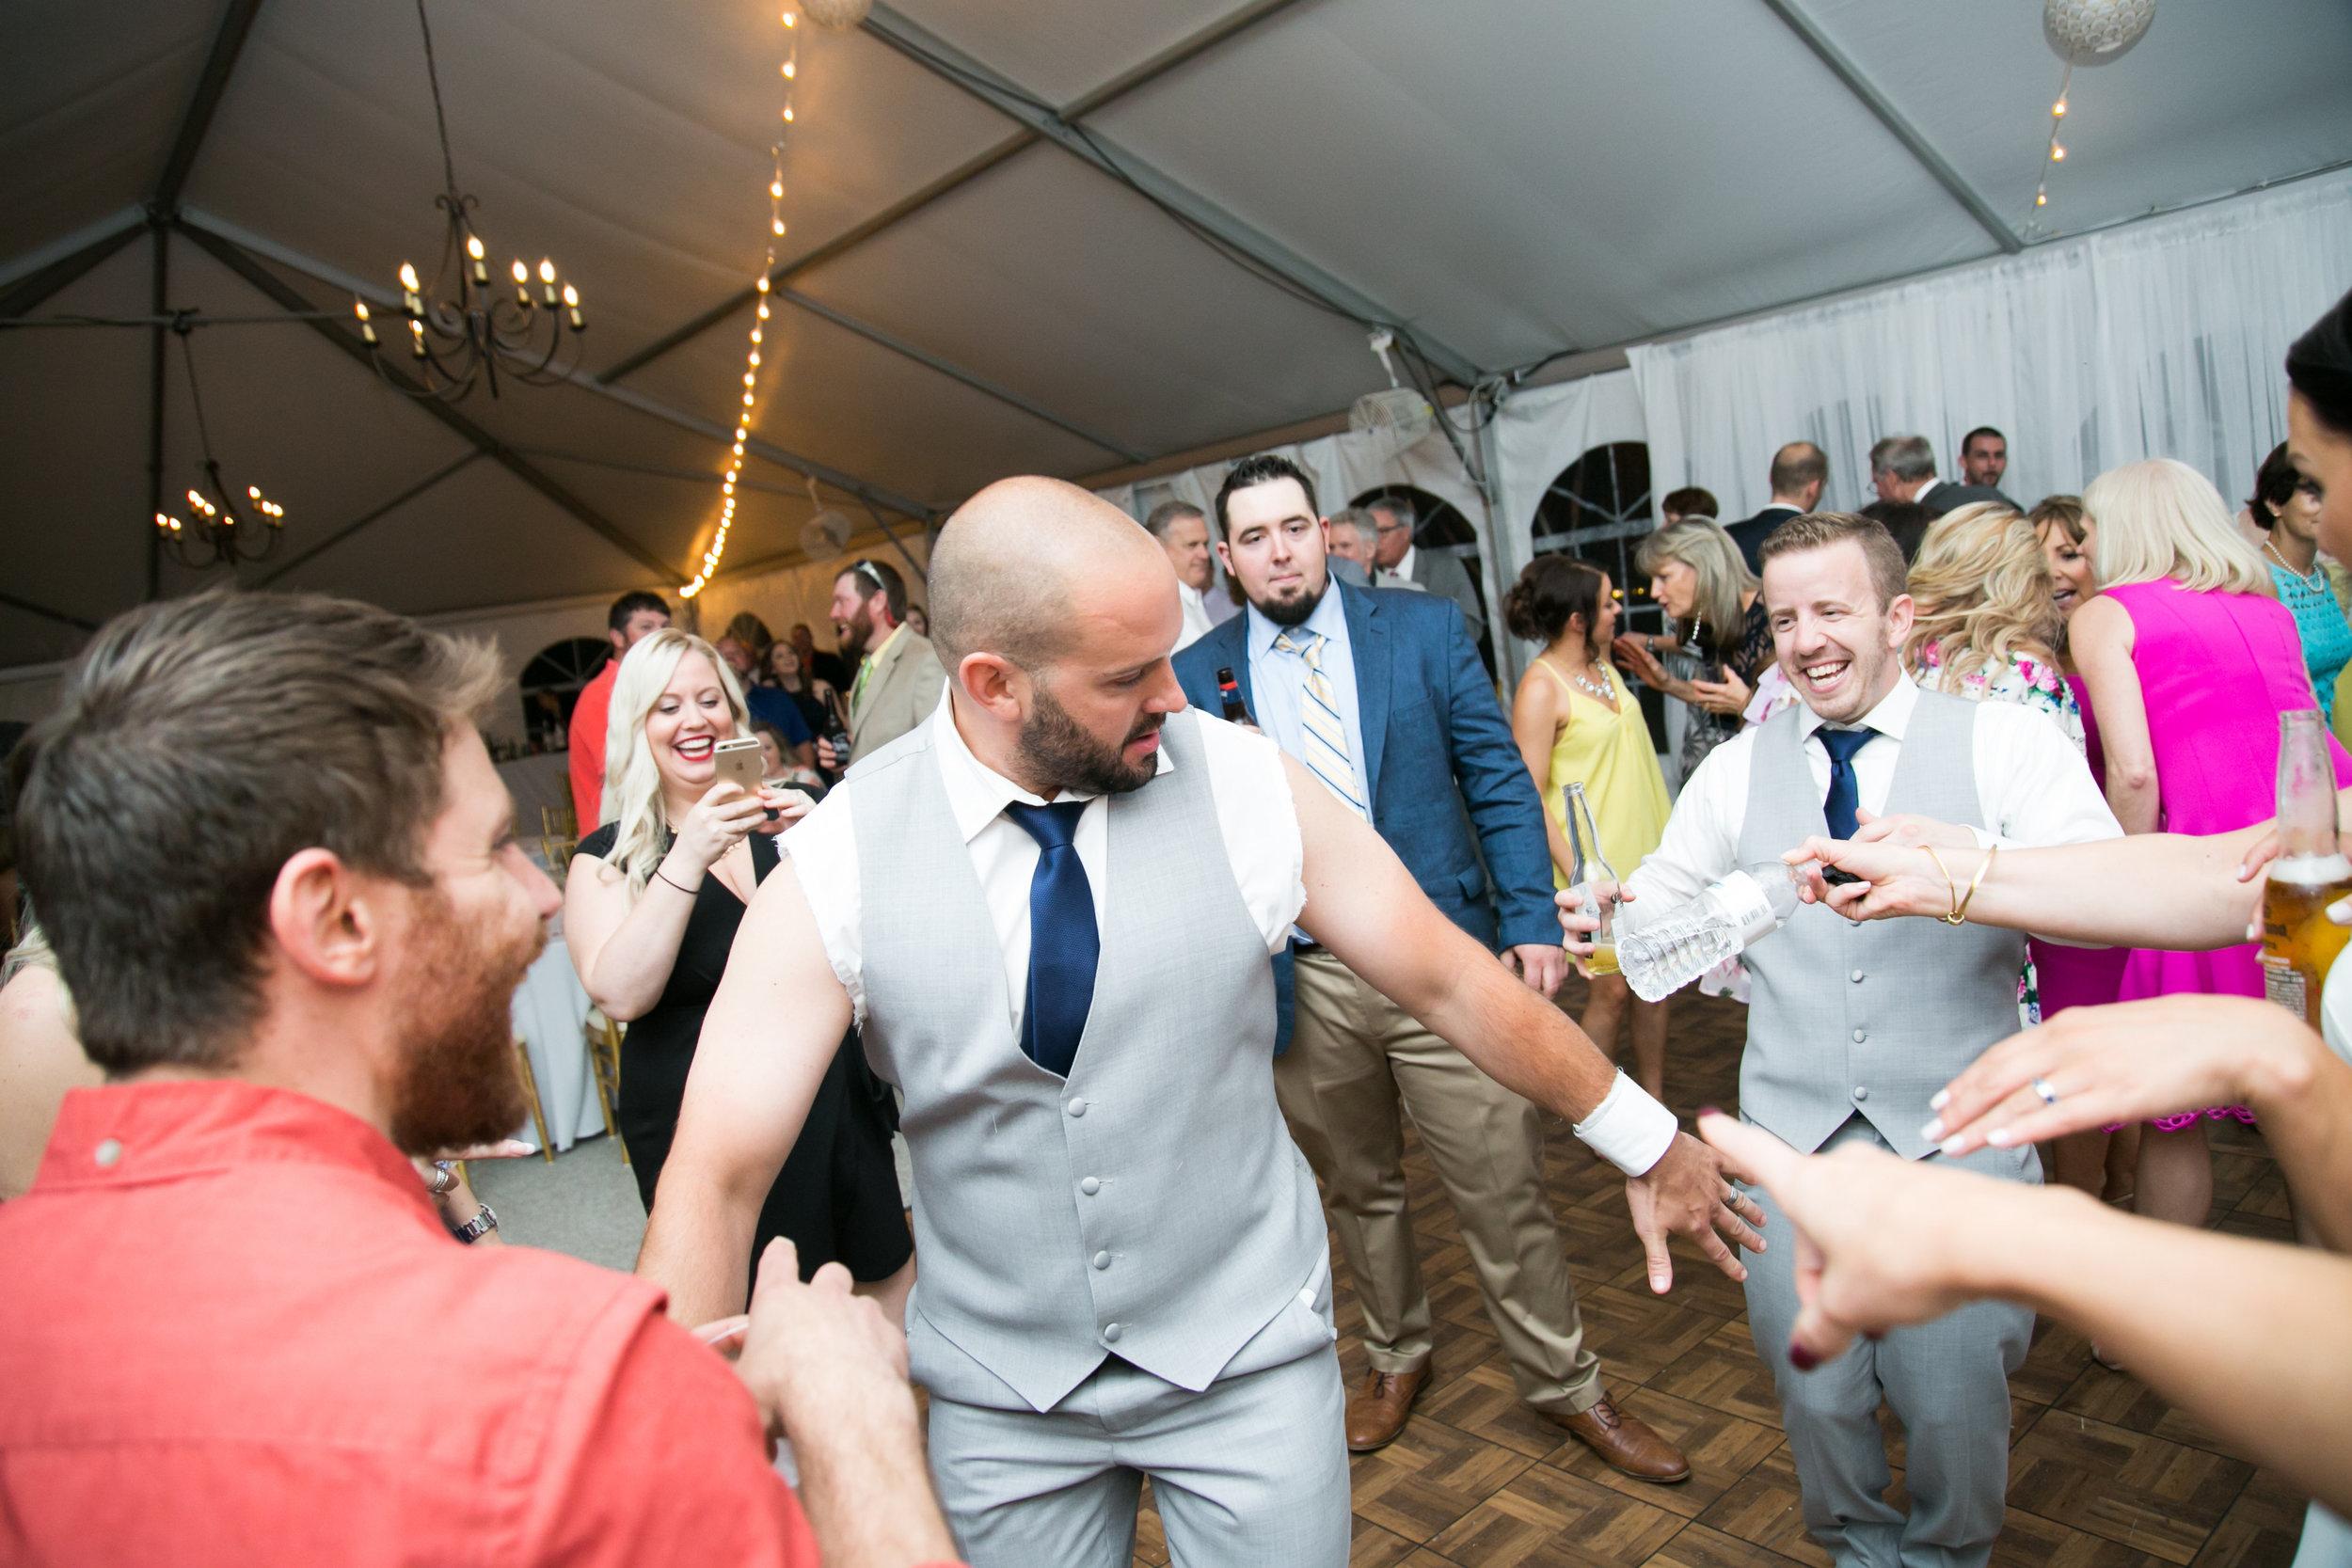 Pure elegance events Tynise Kee dc wedding planner va wedding planner rust manor house leesburg -0066.jpg